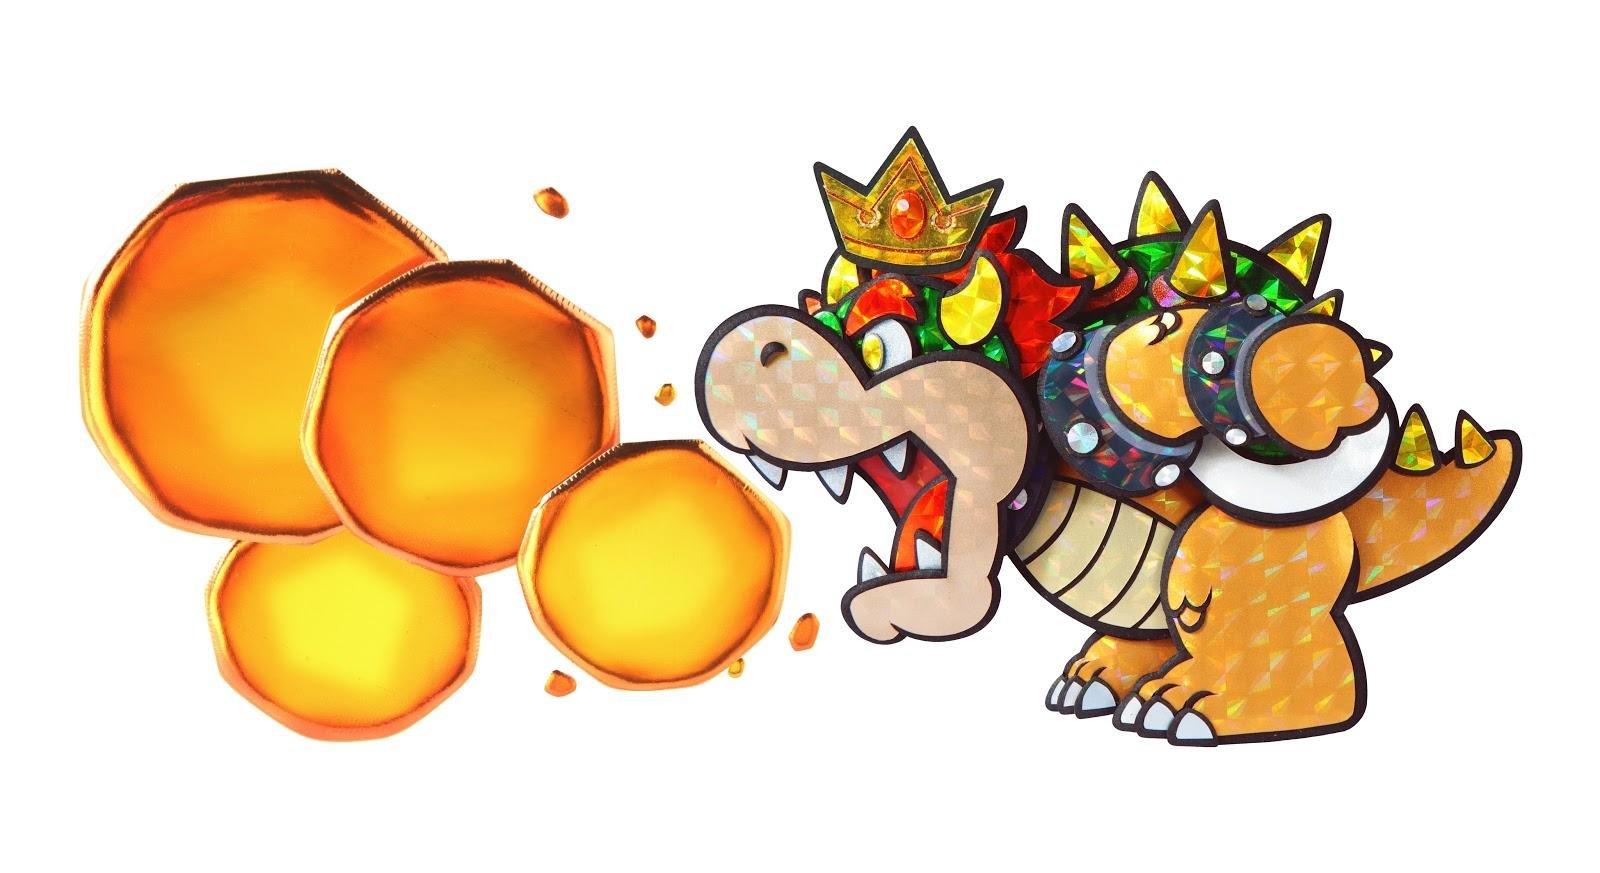 Paper Mario Sticker Star - Arte 6